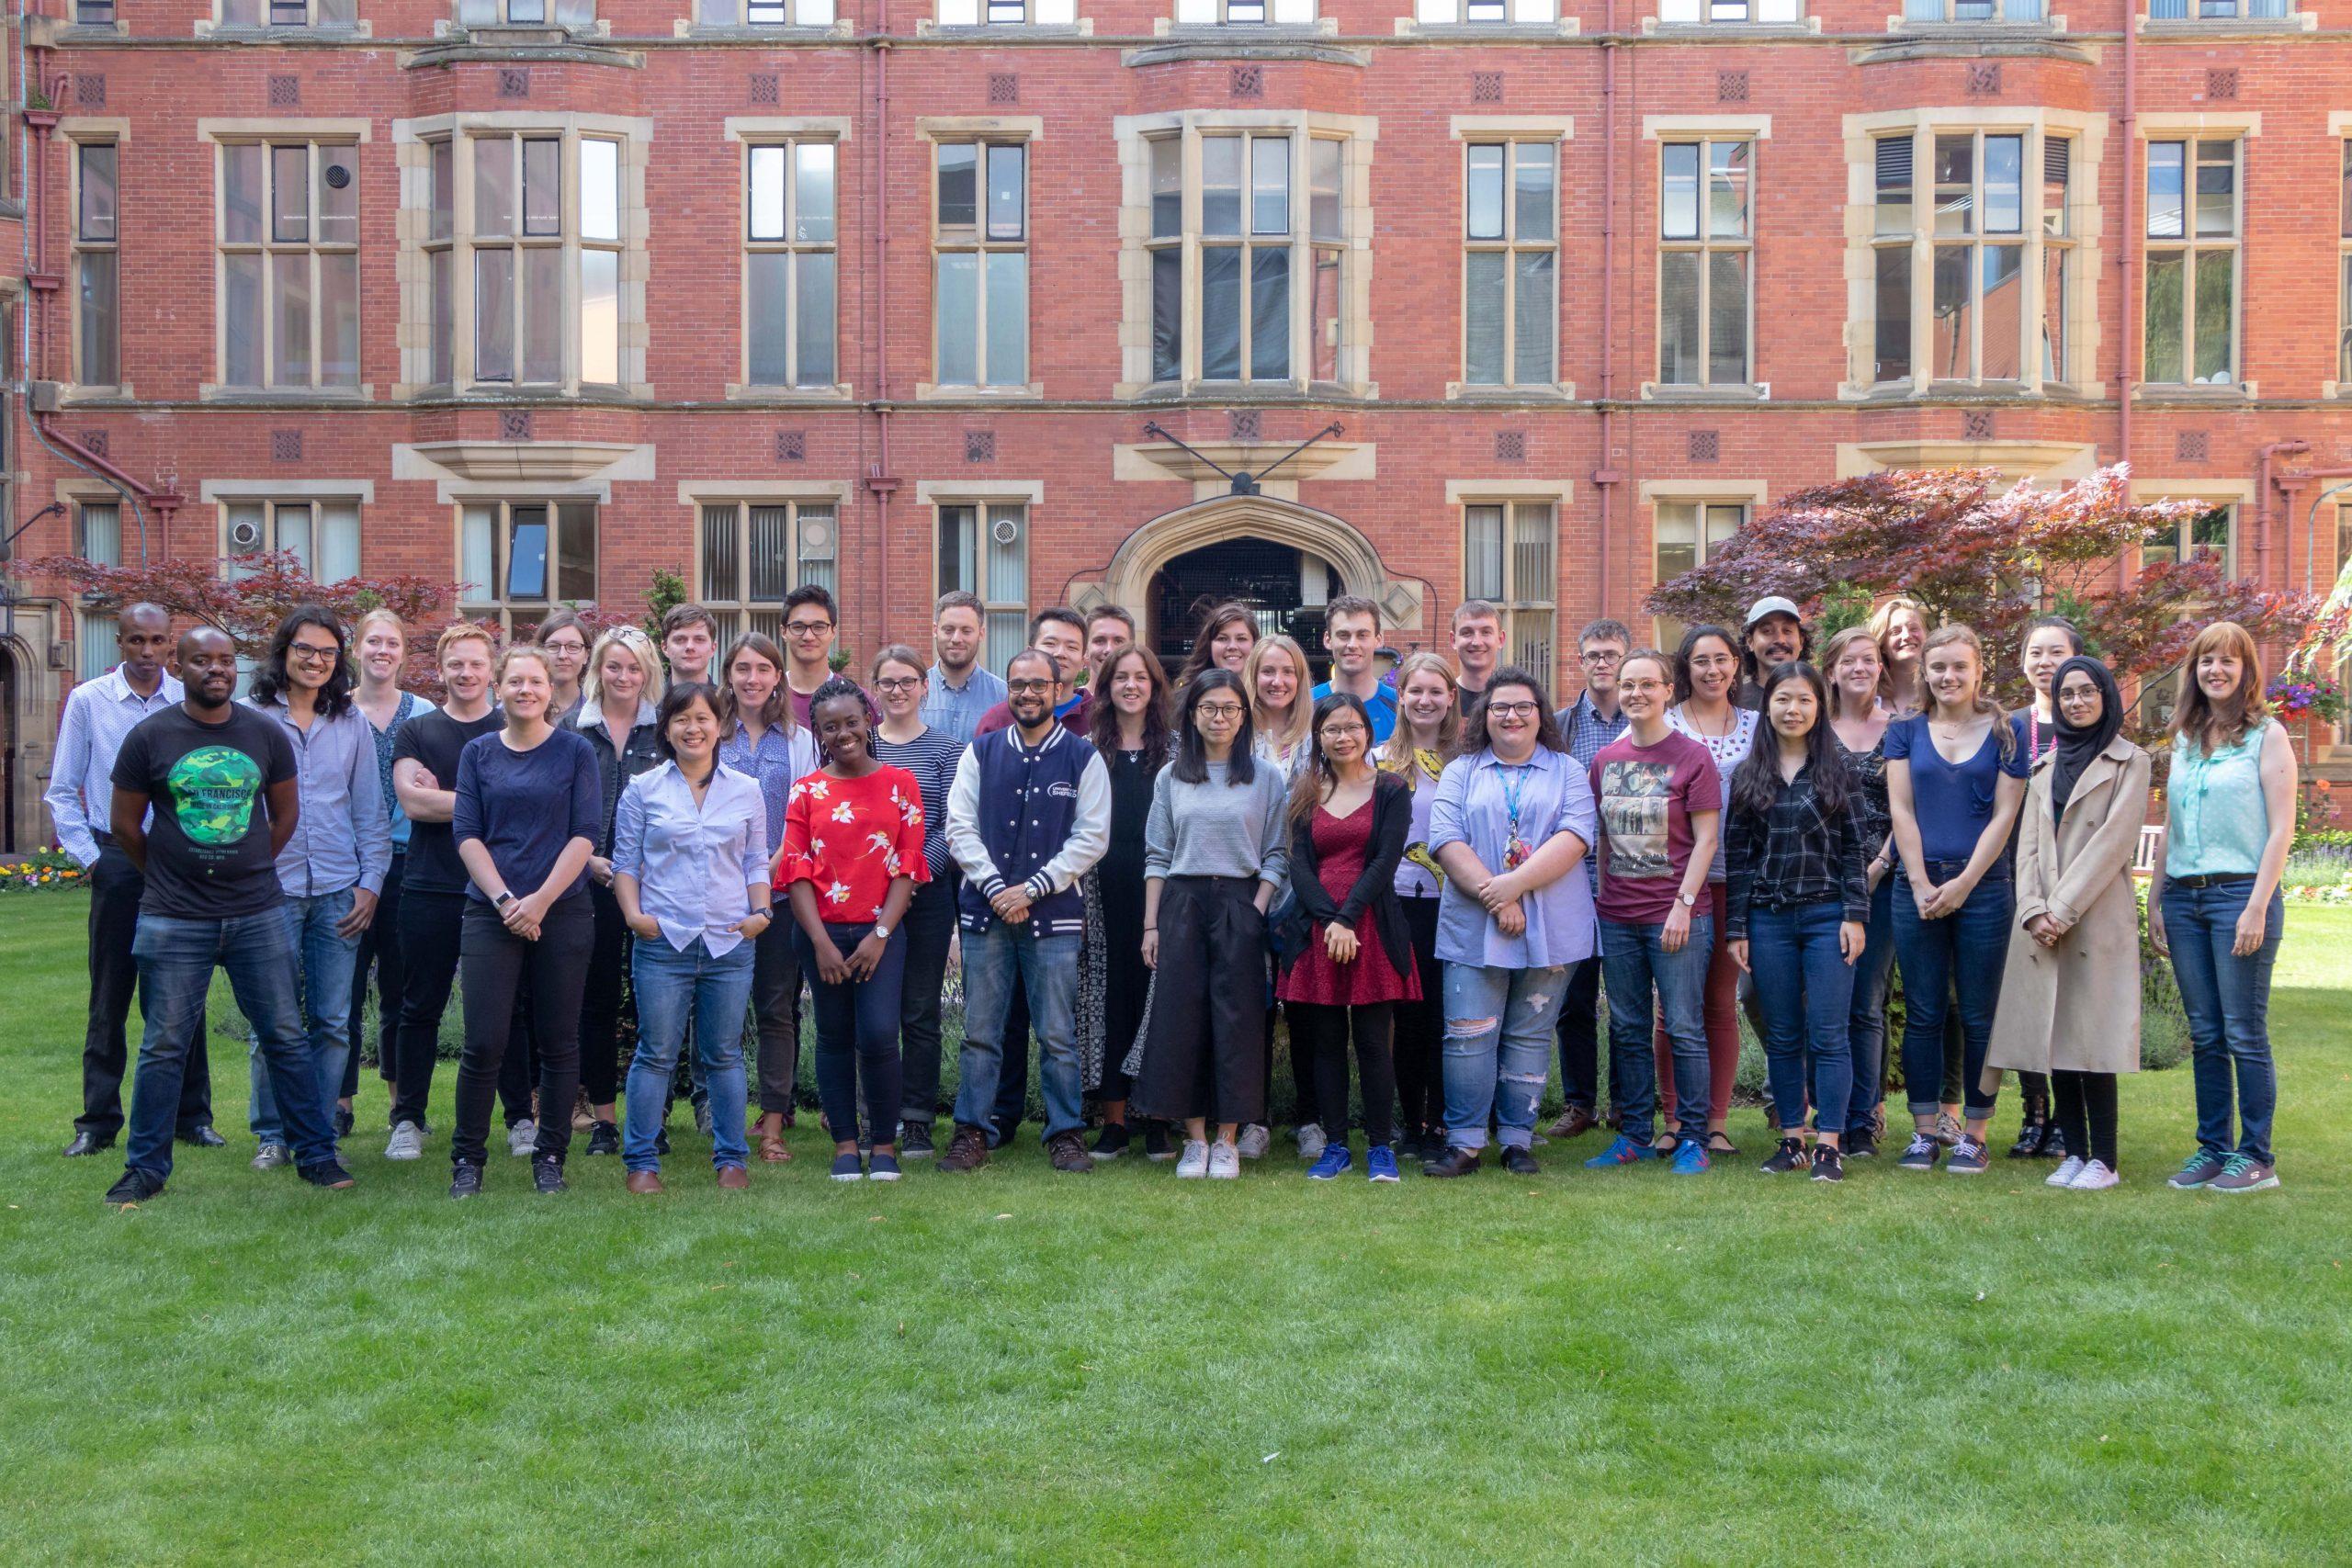 The Grantham Scholars